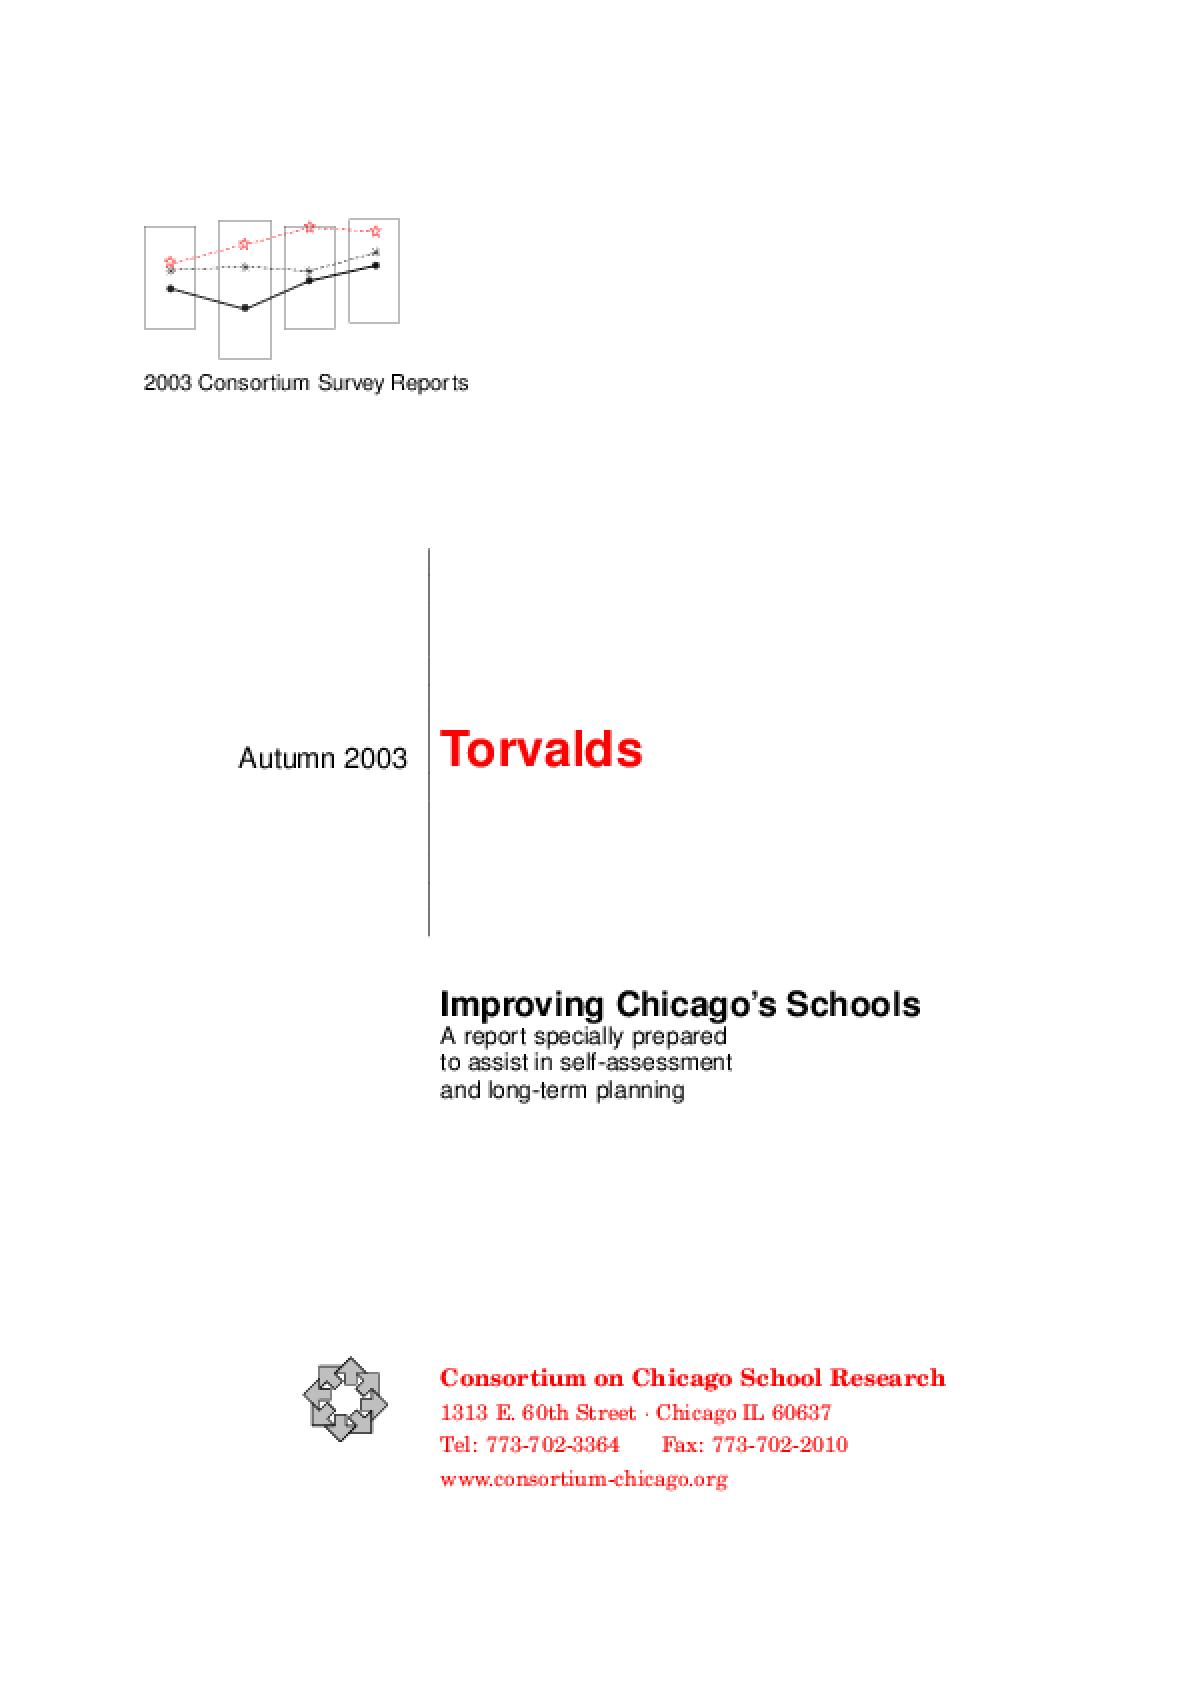 Improving Chicago's Schools: Torvalds